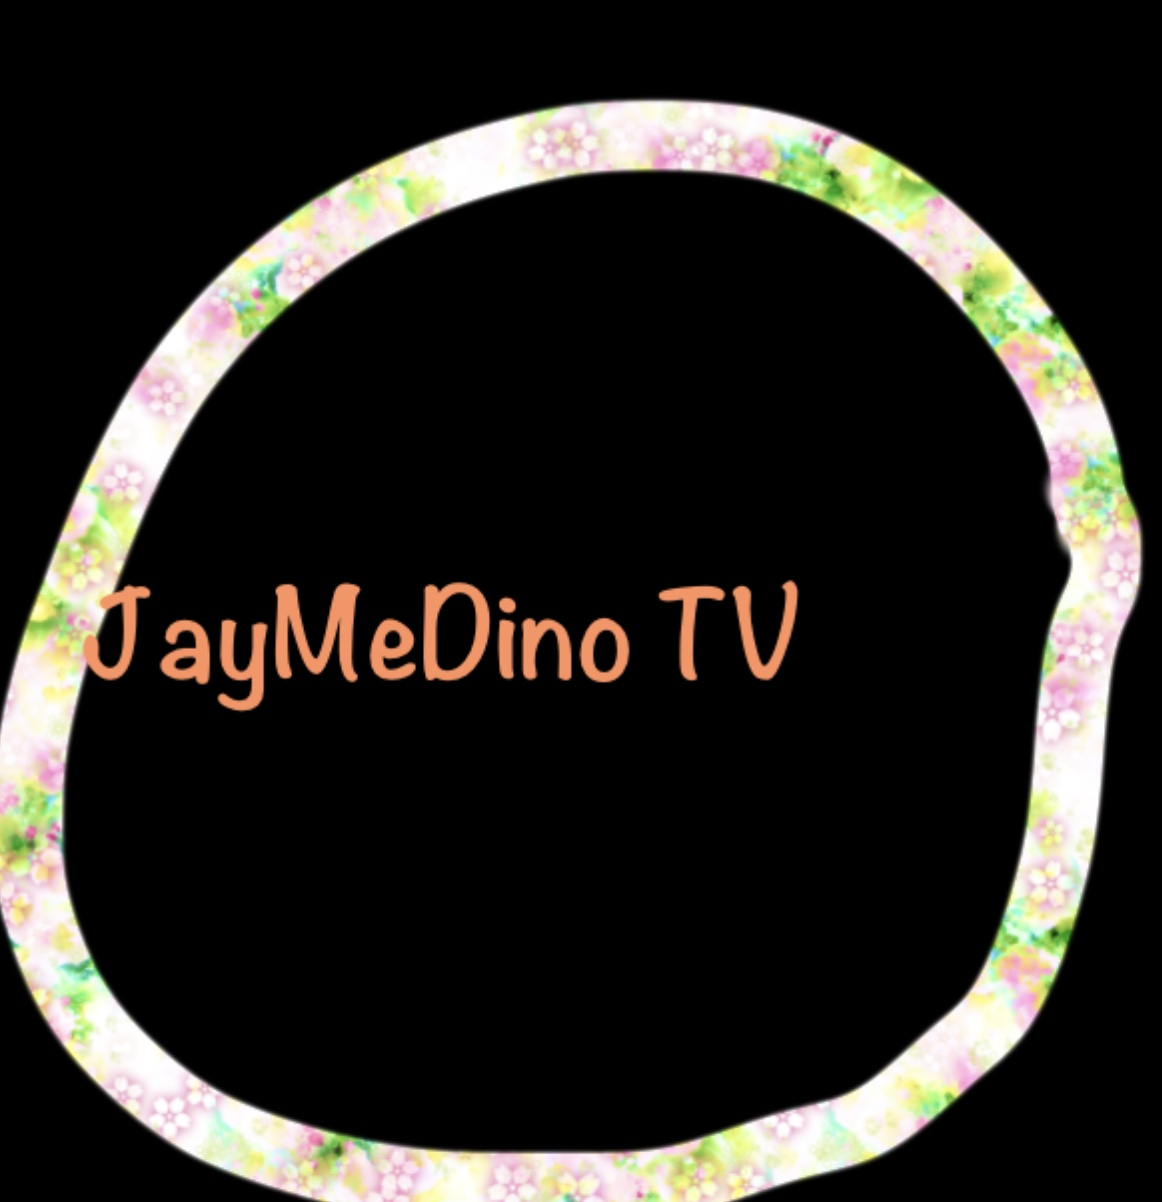 JayMeDino TV